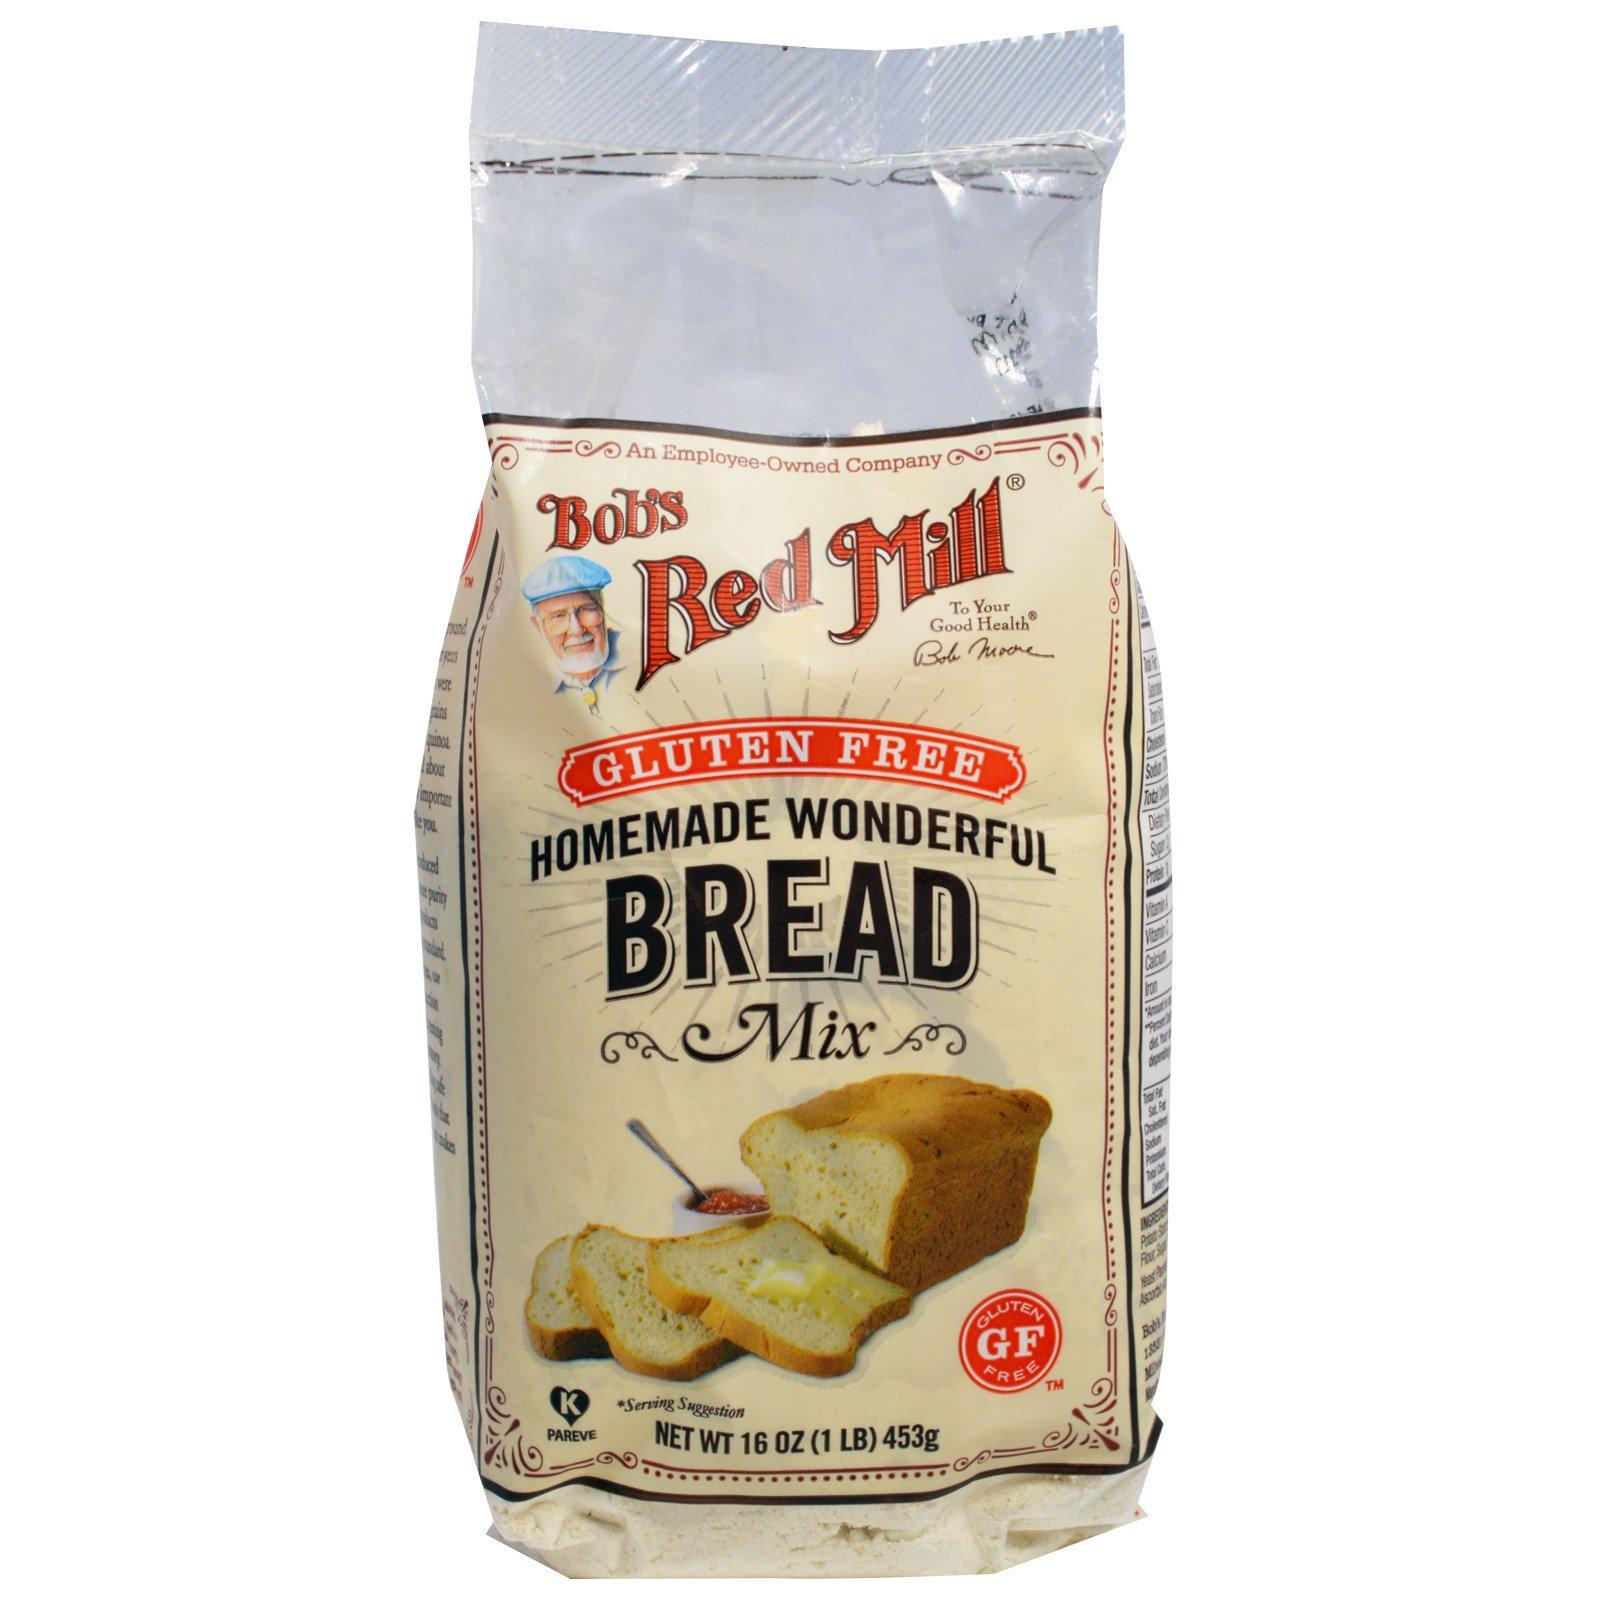 Bob S Red Mill Homemade Wonderful Bread Mix Gluten Free 16 Oz 453 G Iherb